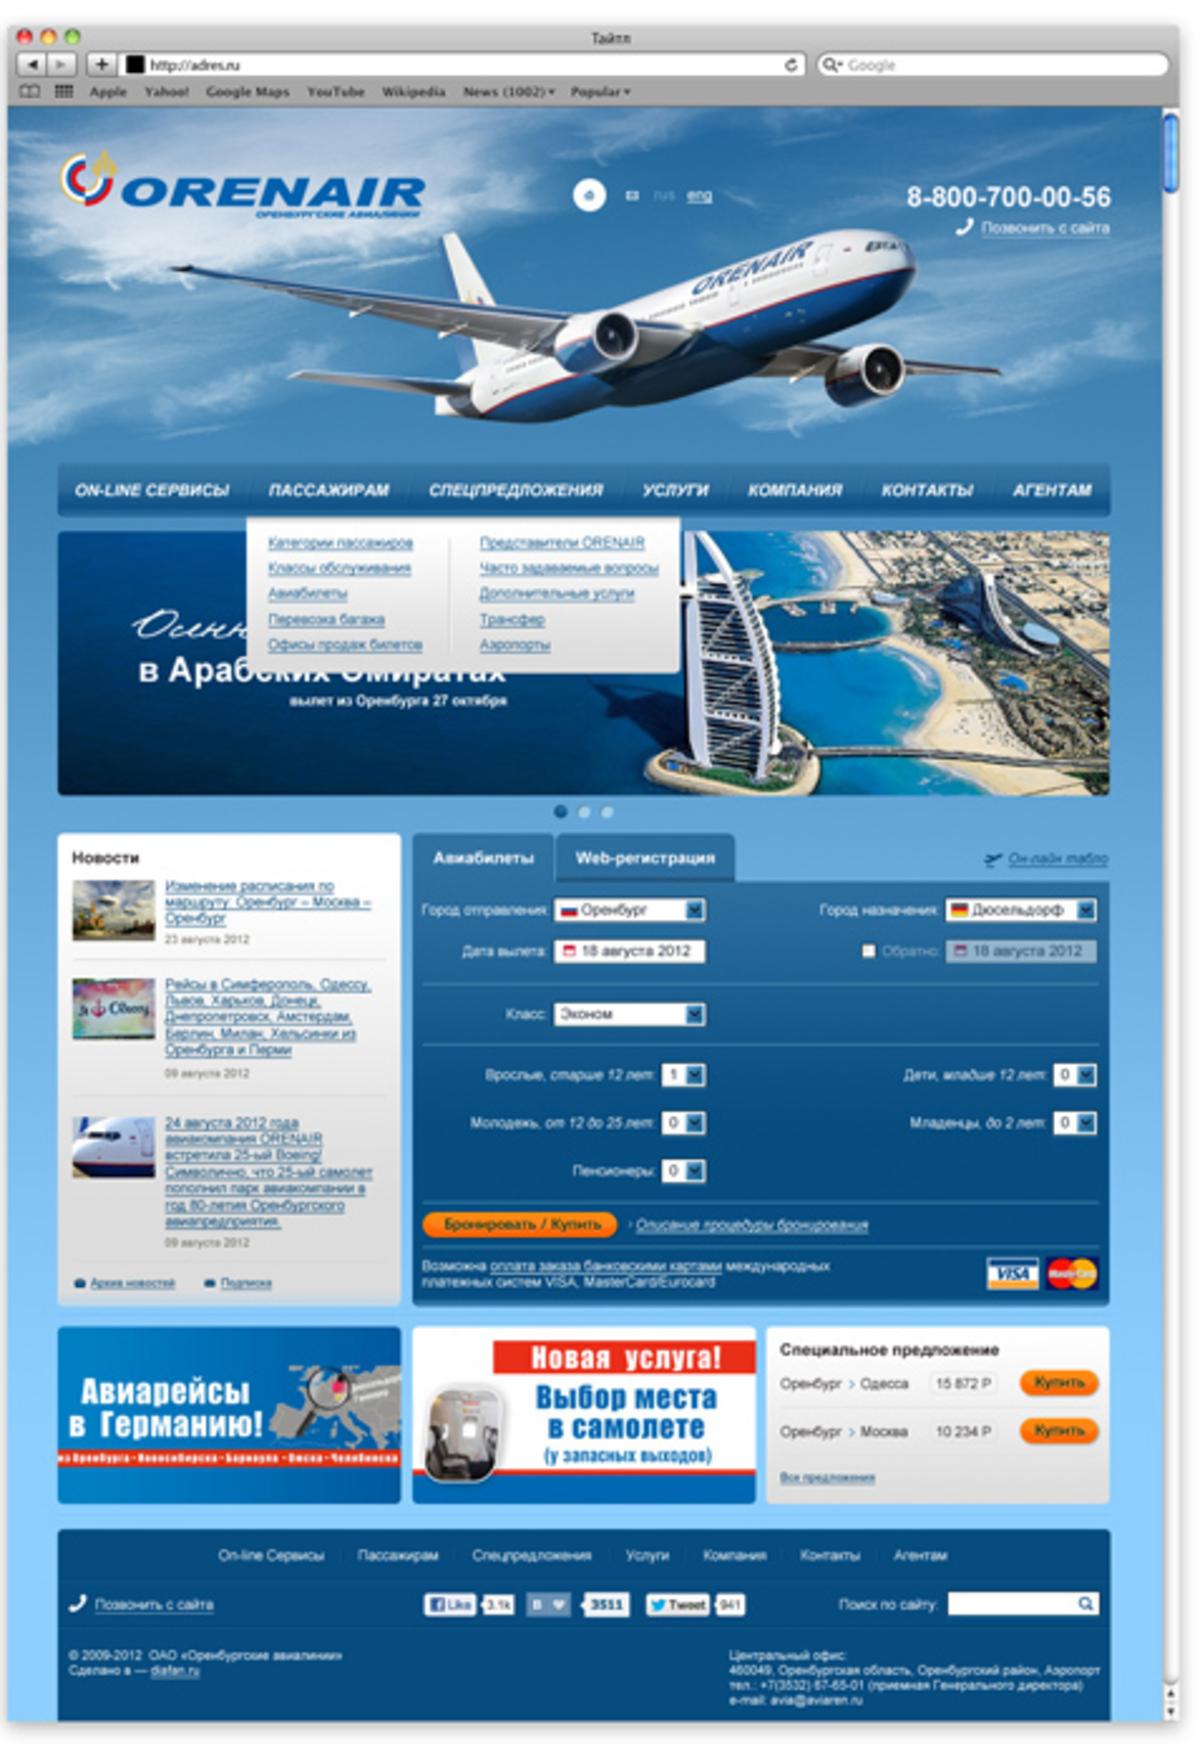 Авиакомпания ORENAIR / Проект компании DIAFAN